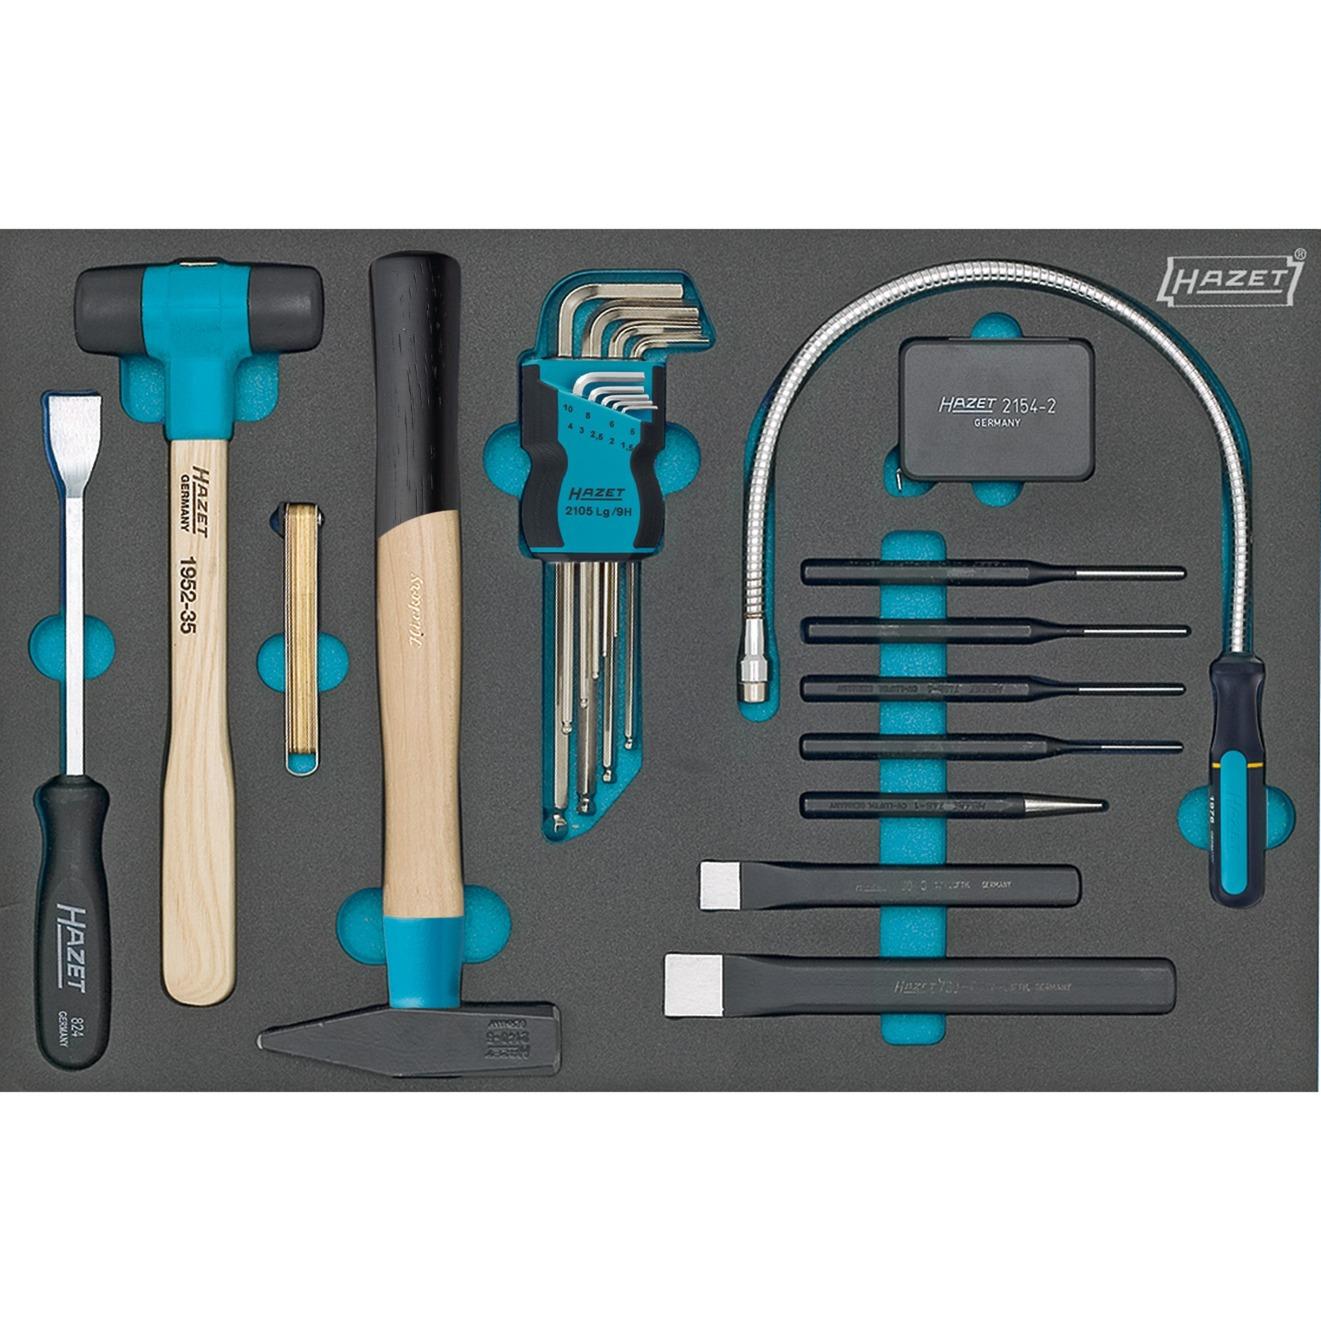 163-60/22, Kit de herramientas